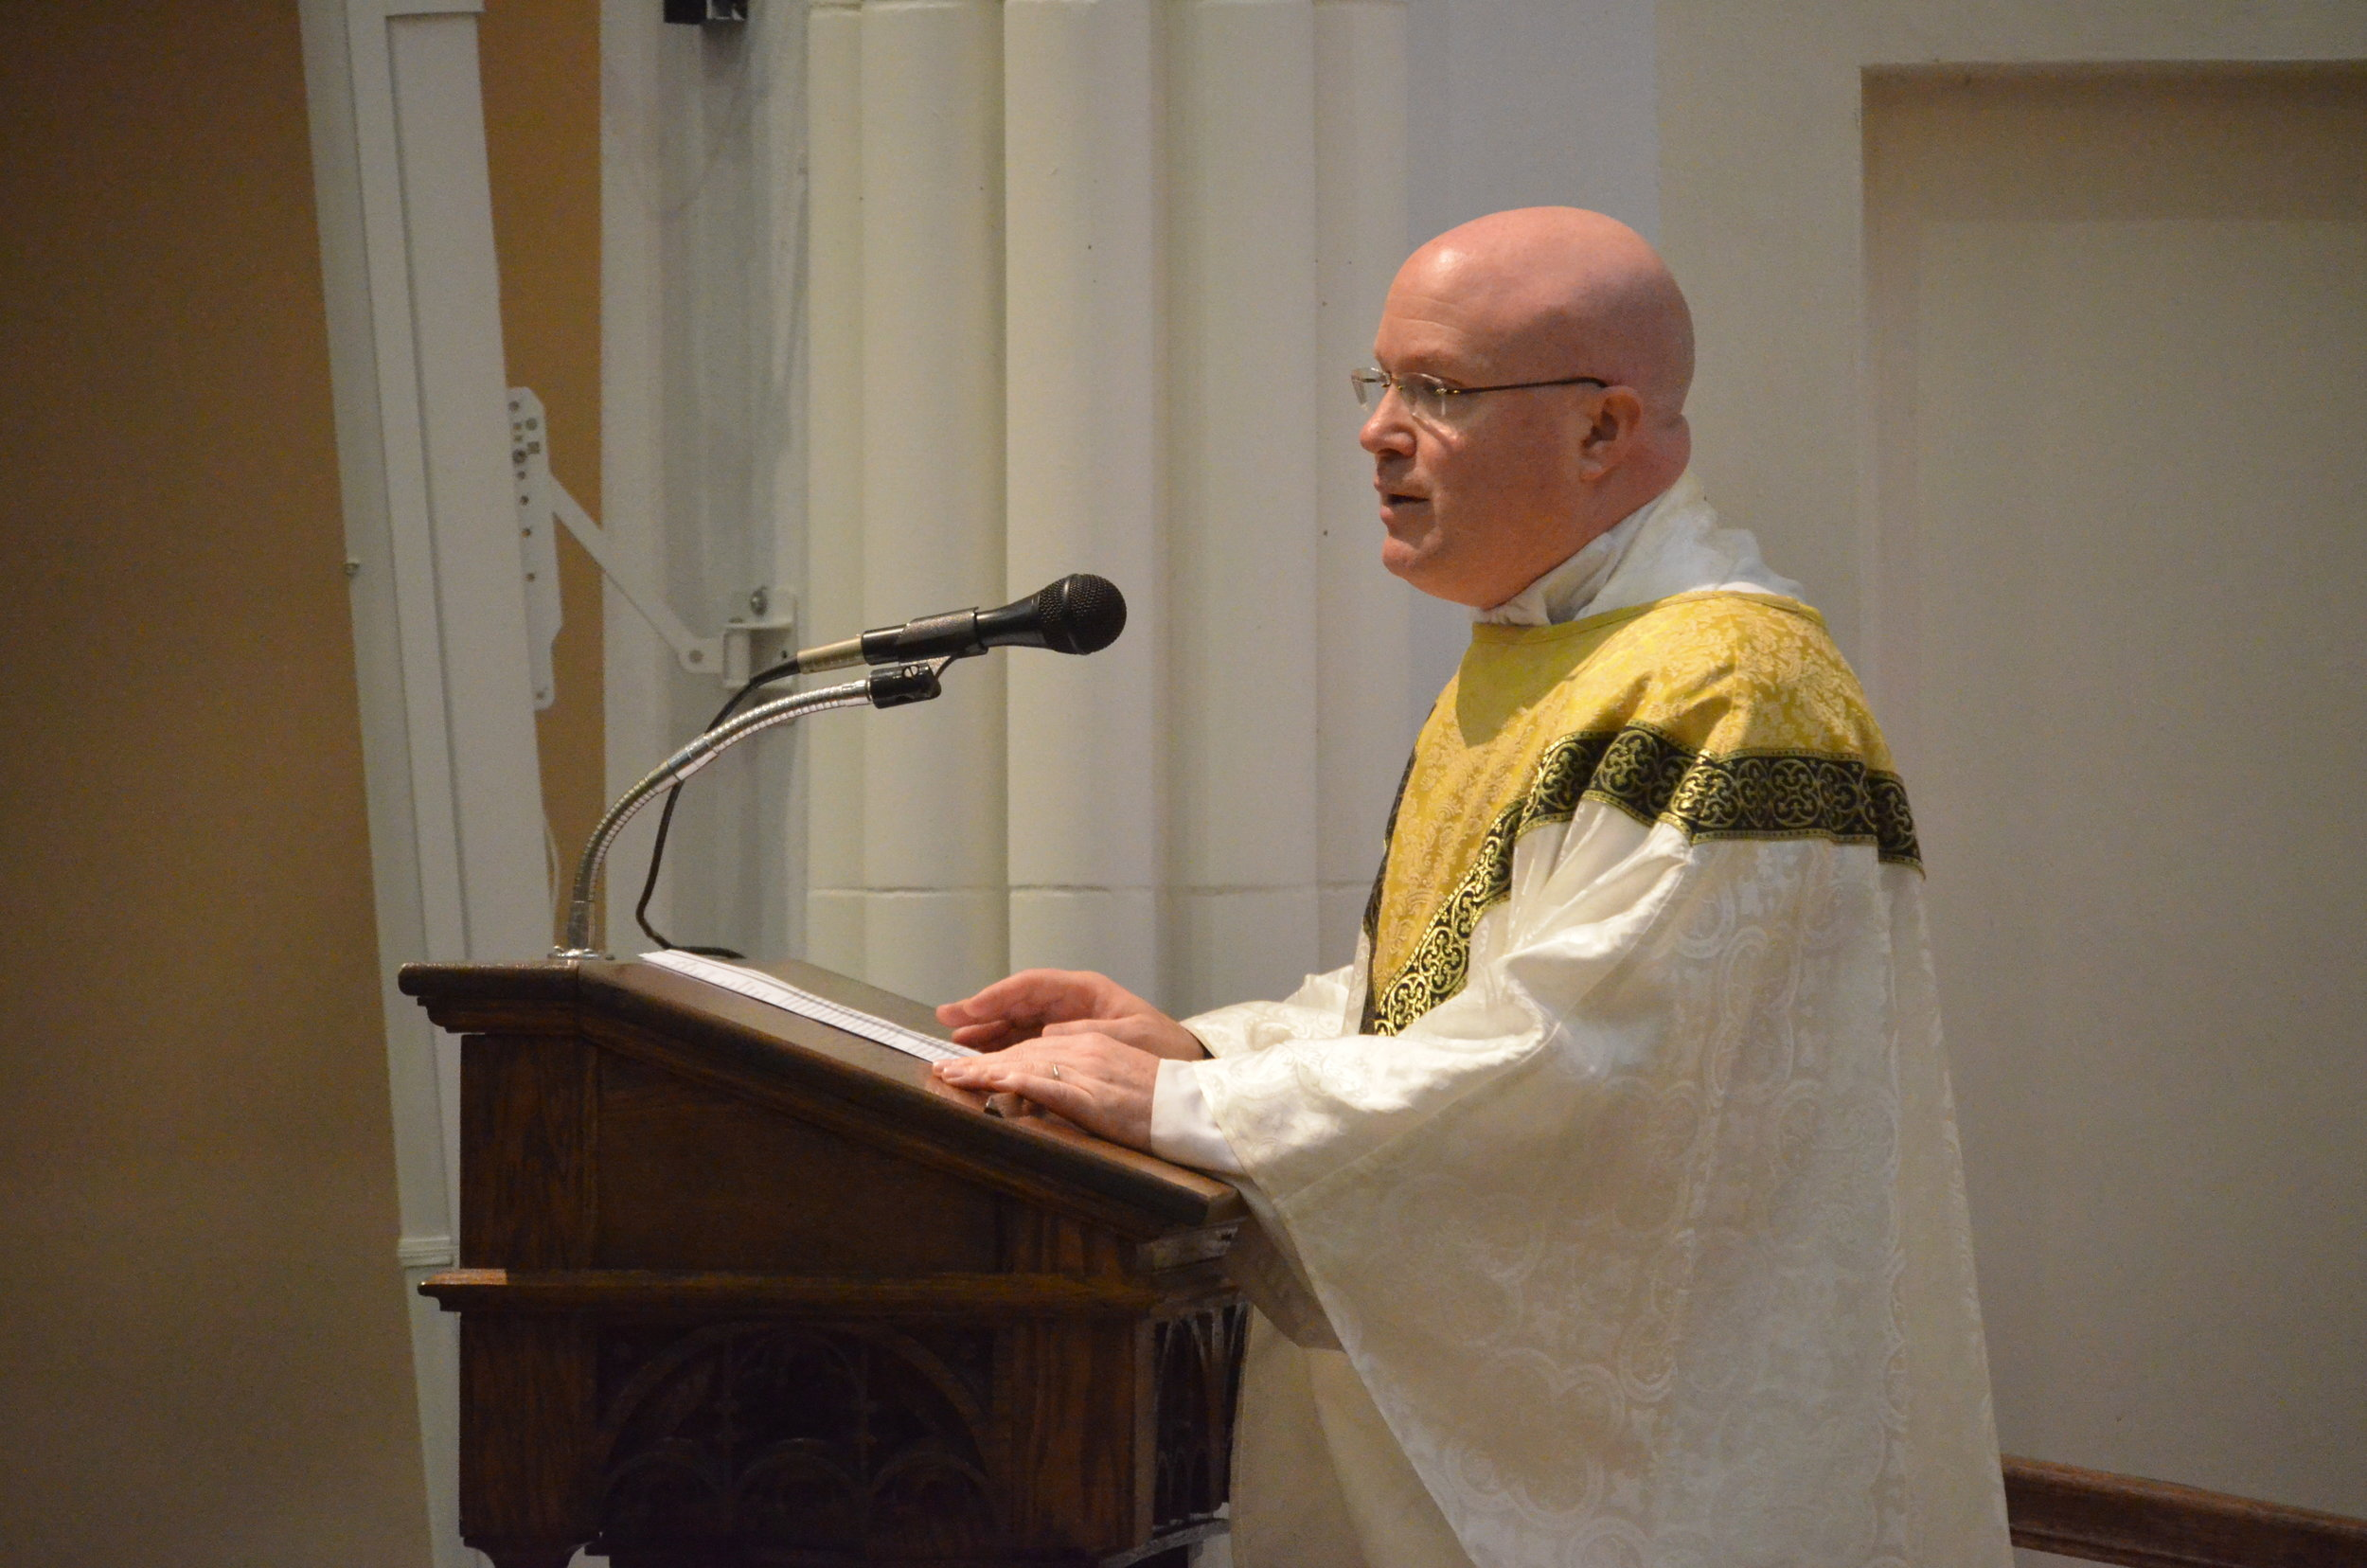 Fr. Roger Landry gives the homily